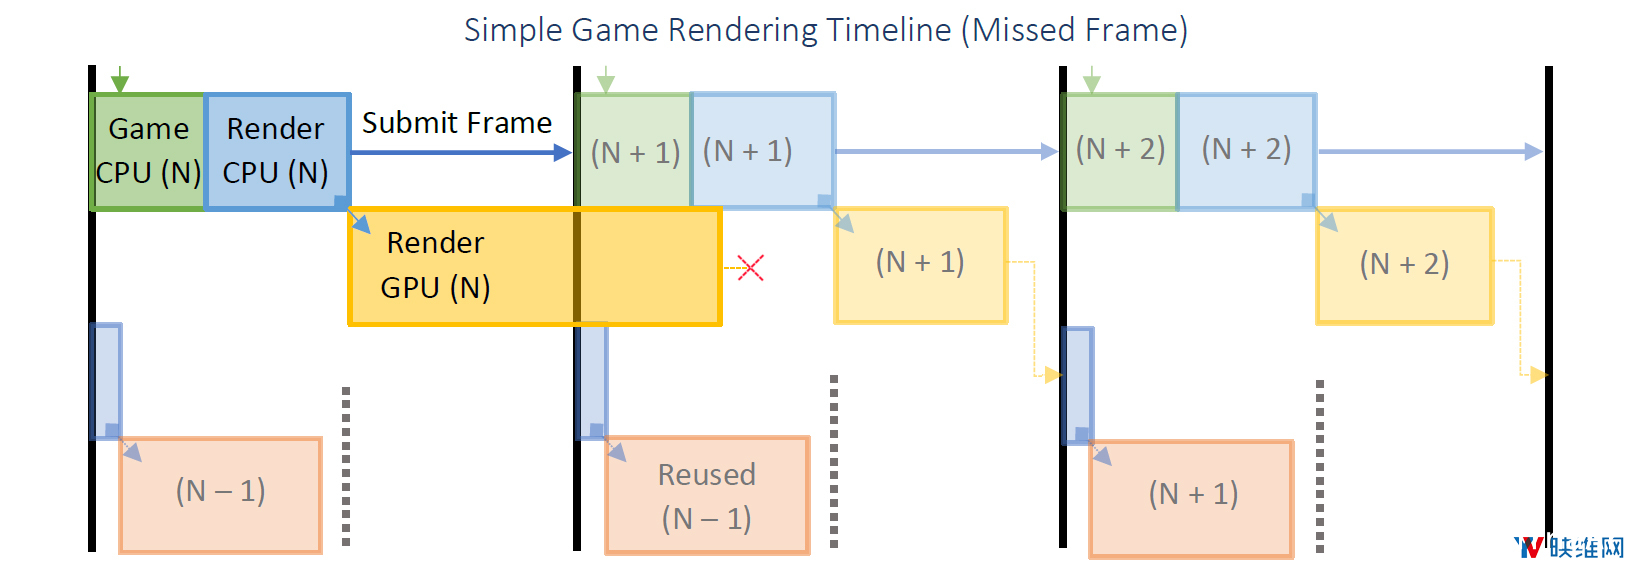 Oculus详述『延迟』问题及对应『帧渲染』解决方案 资源教程 第3张